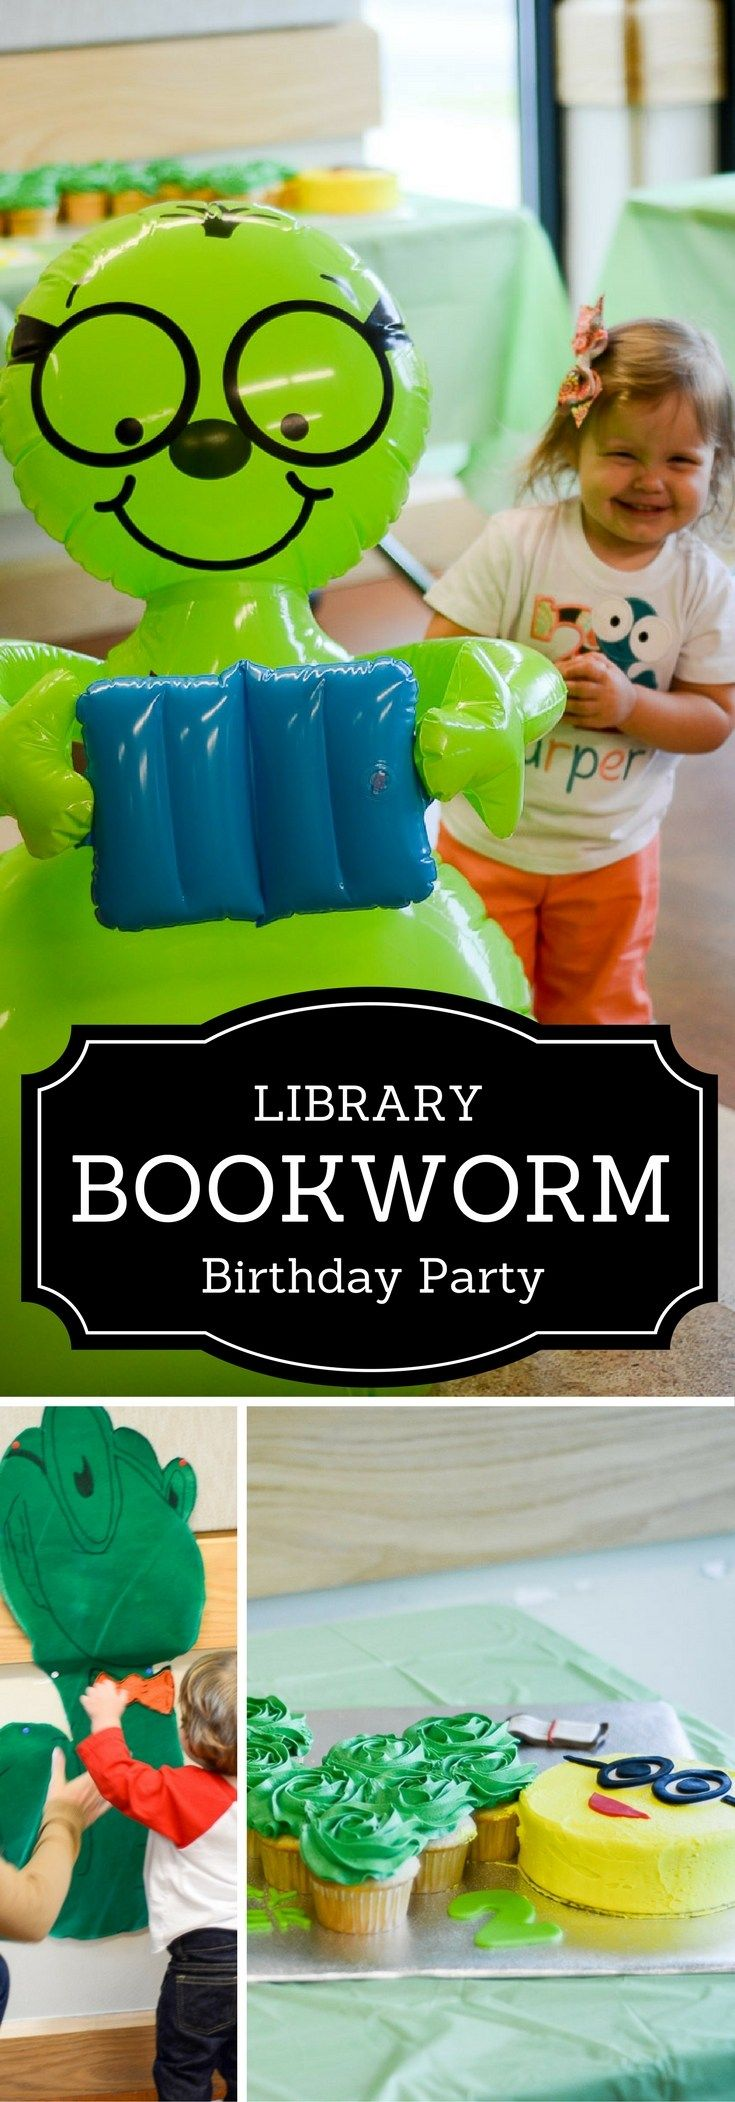 Book Worm Birthday Wording Birthday Words Bookworm Party Book Worms